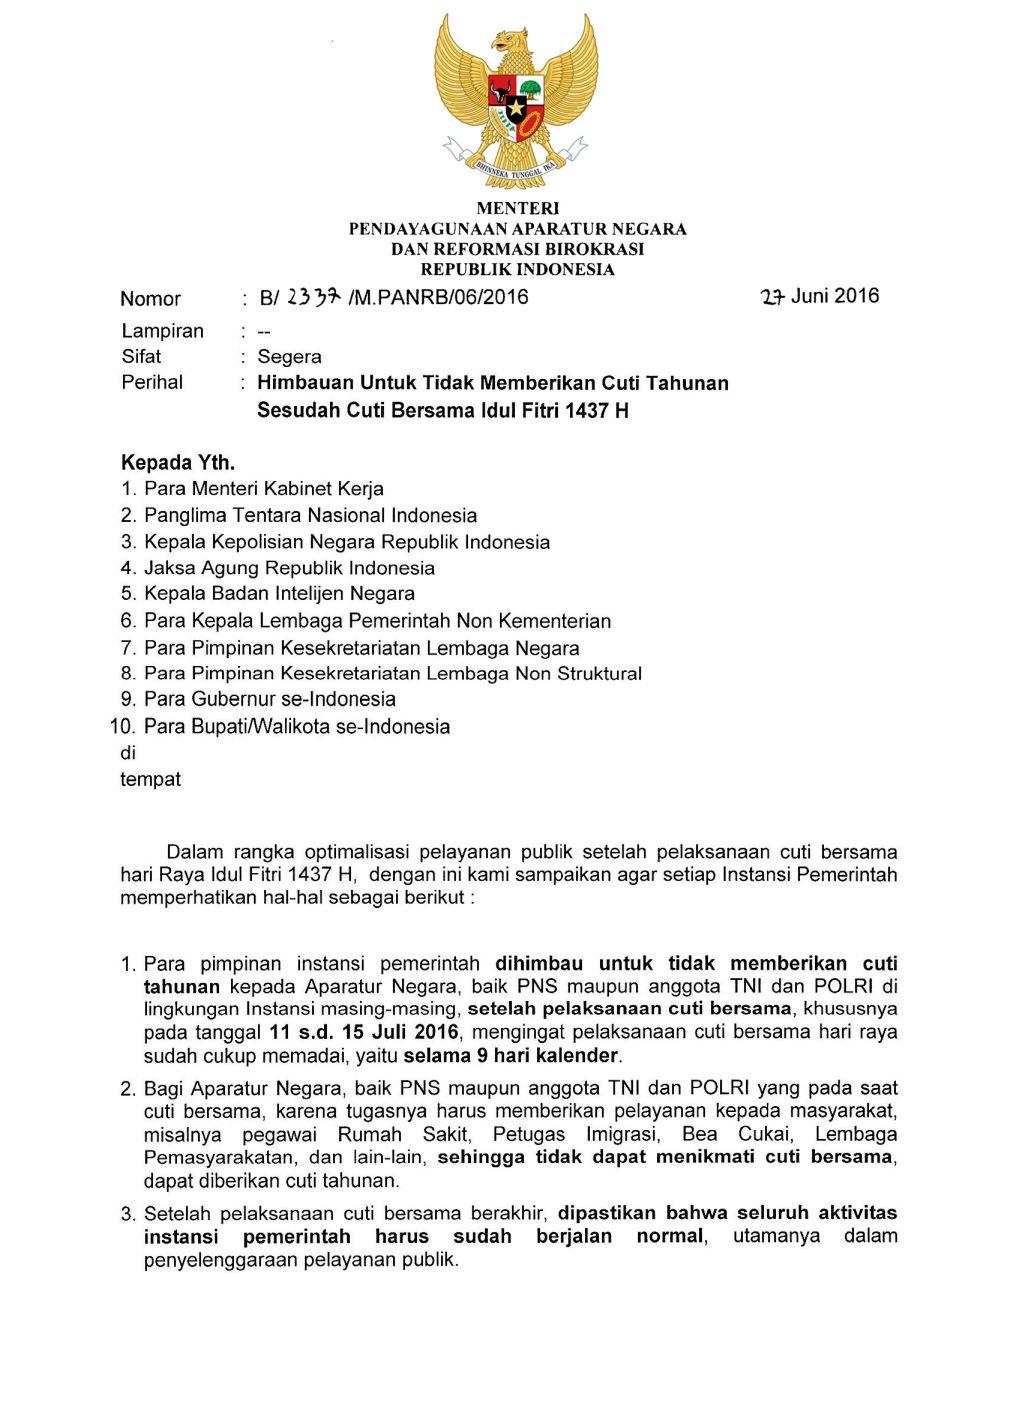 Surat Edaran Menpan RB Tentang Himbauan Untuk Tidak